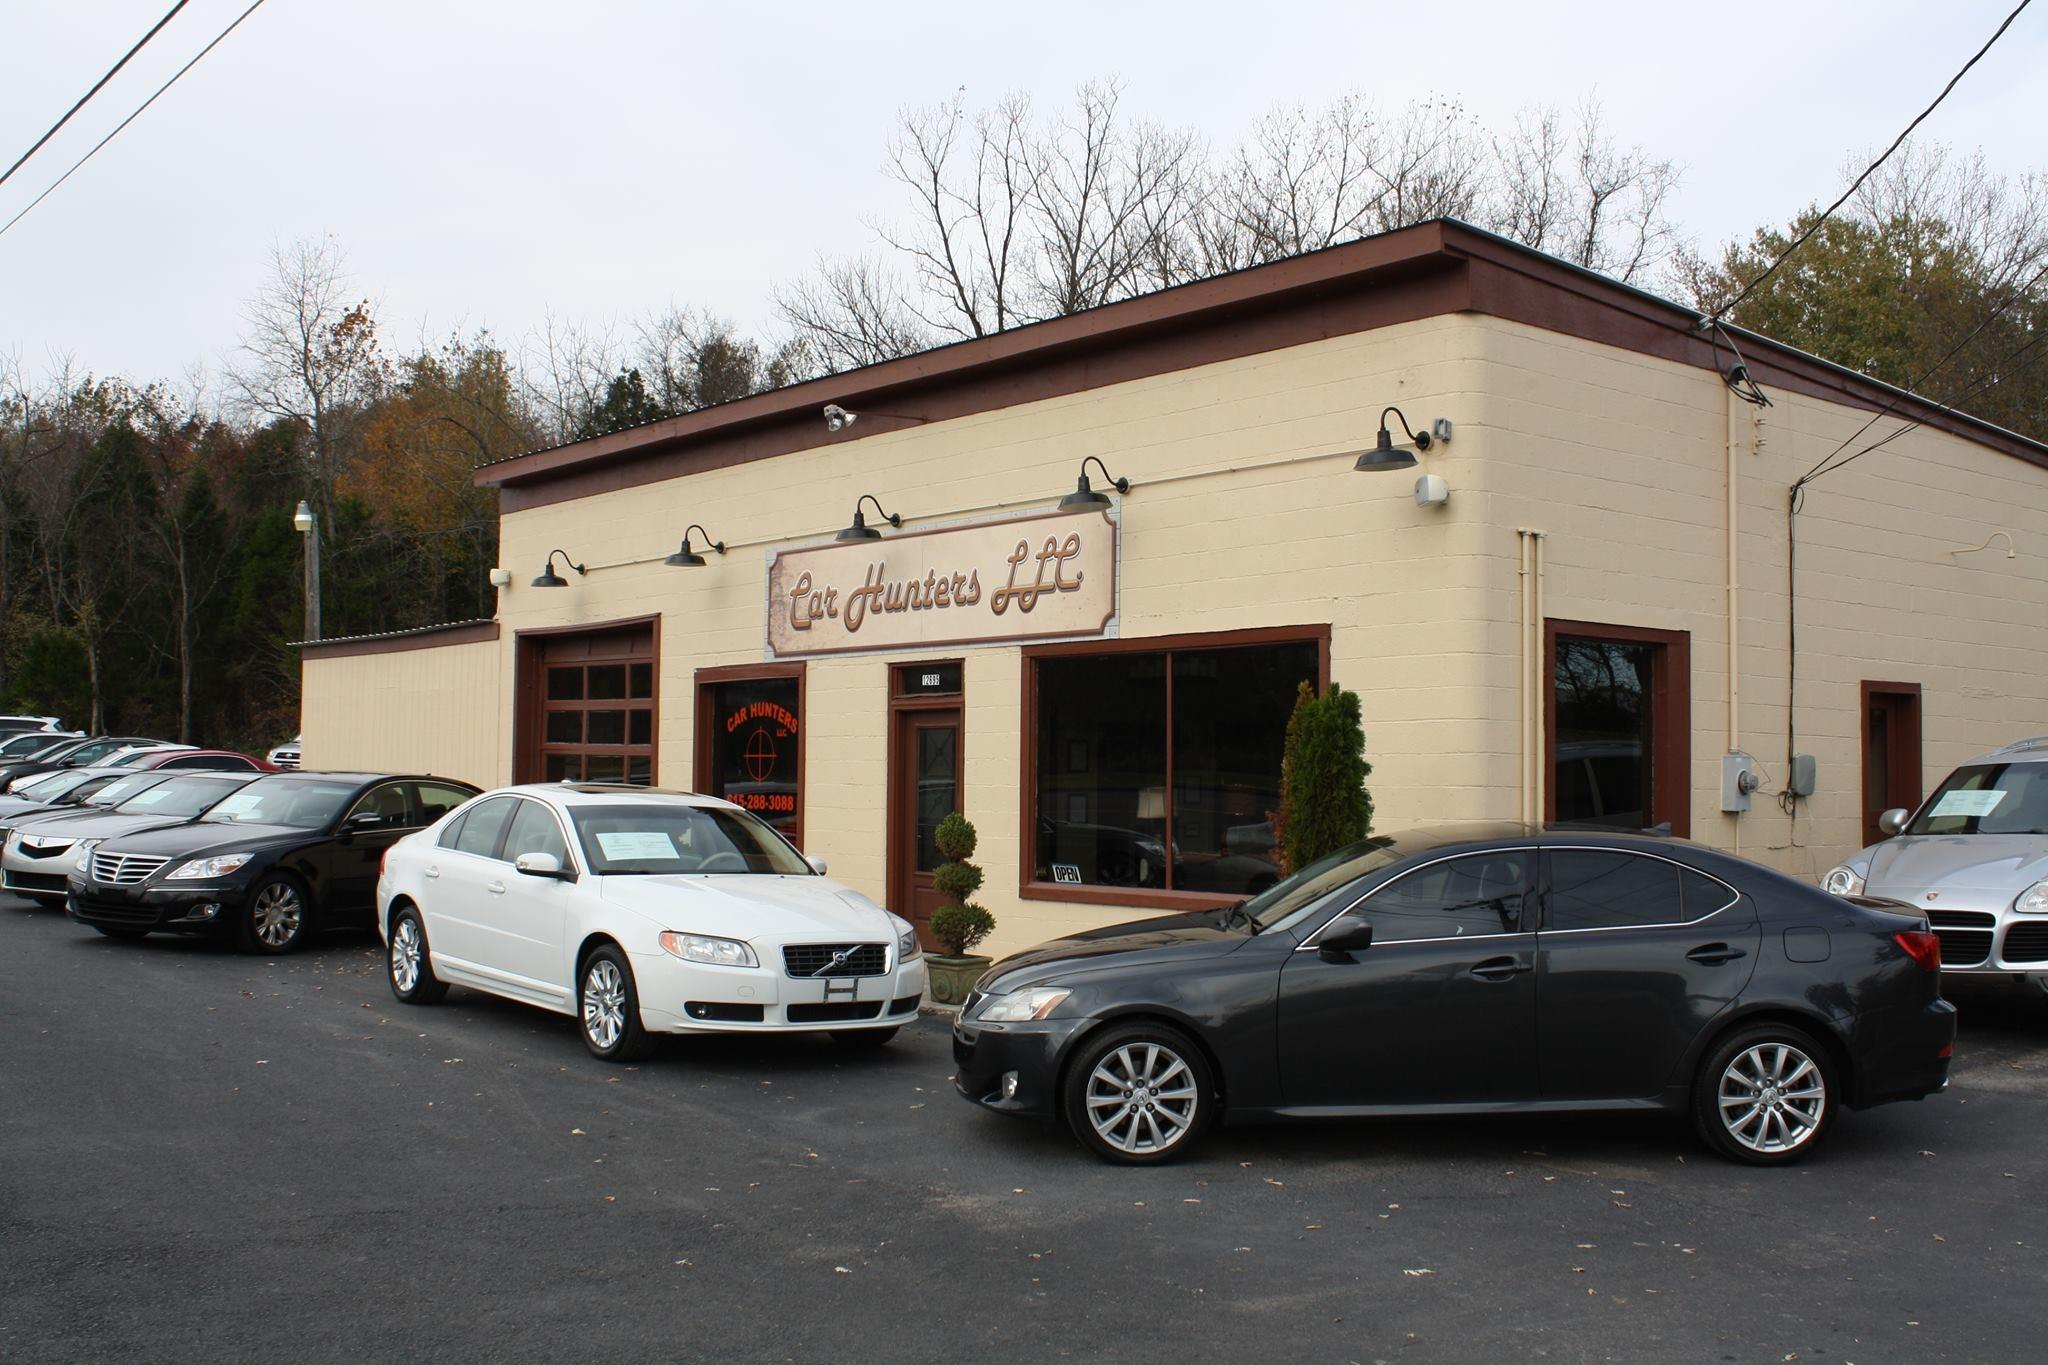 Car Hunters LLC image 2